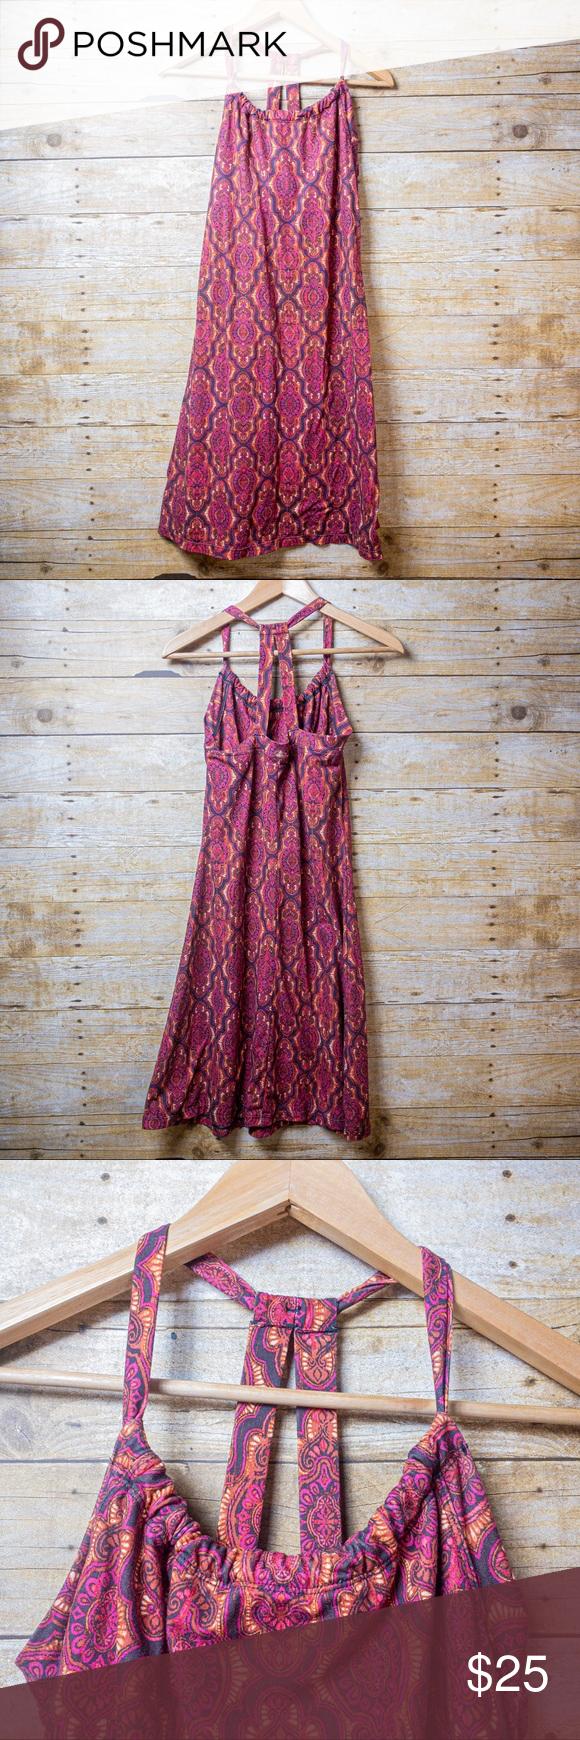 Prana Summer Dress Orange Pink Clothes Design Summer Dresses Colorful Dresses [ 1740 x 580 Pixel ]